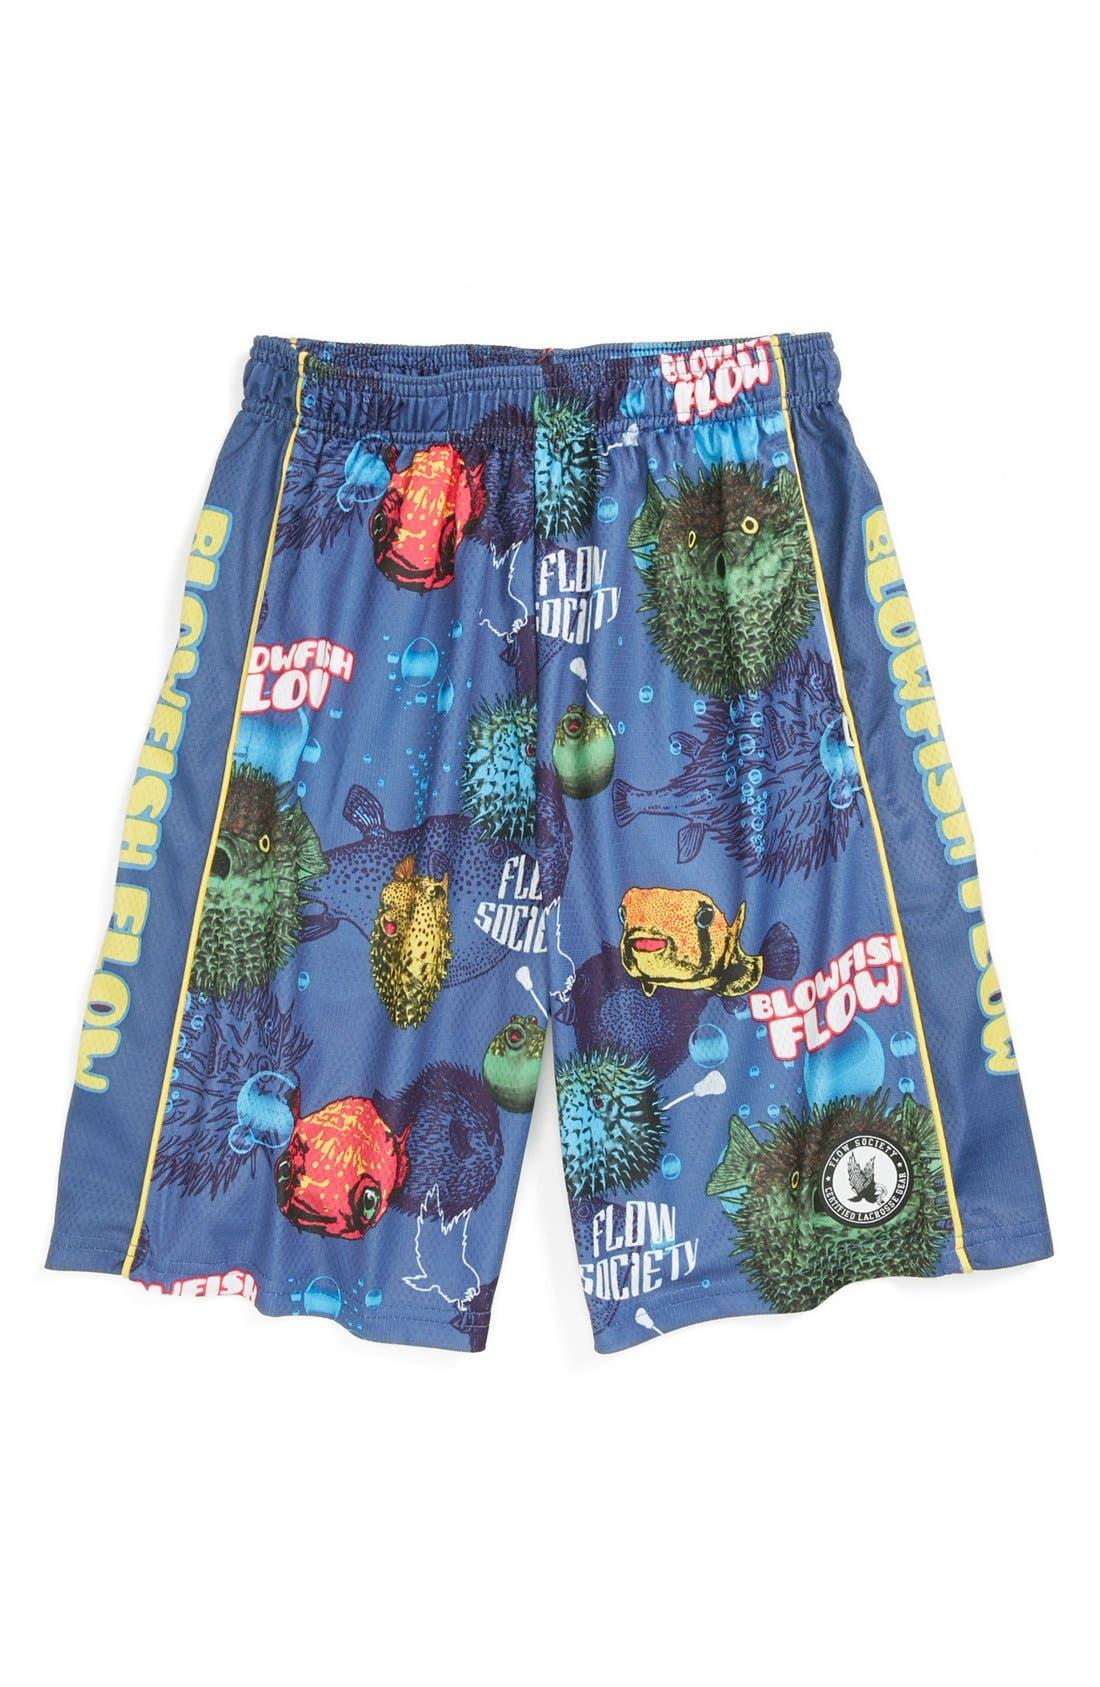 Main Image - Flow Society 'Blowfish' Lacrosse Shorts (Little Boys & Big Boys)